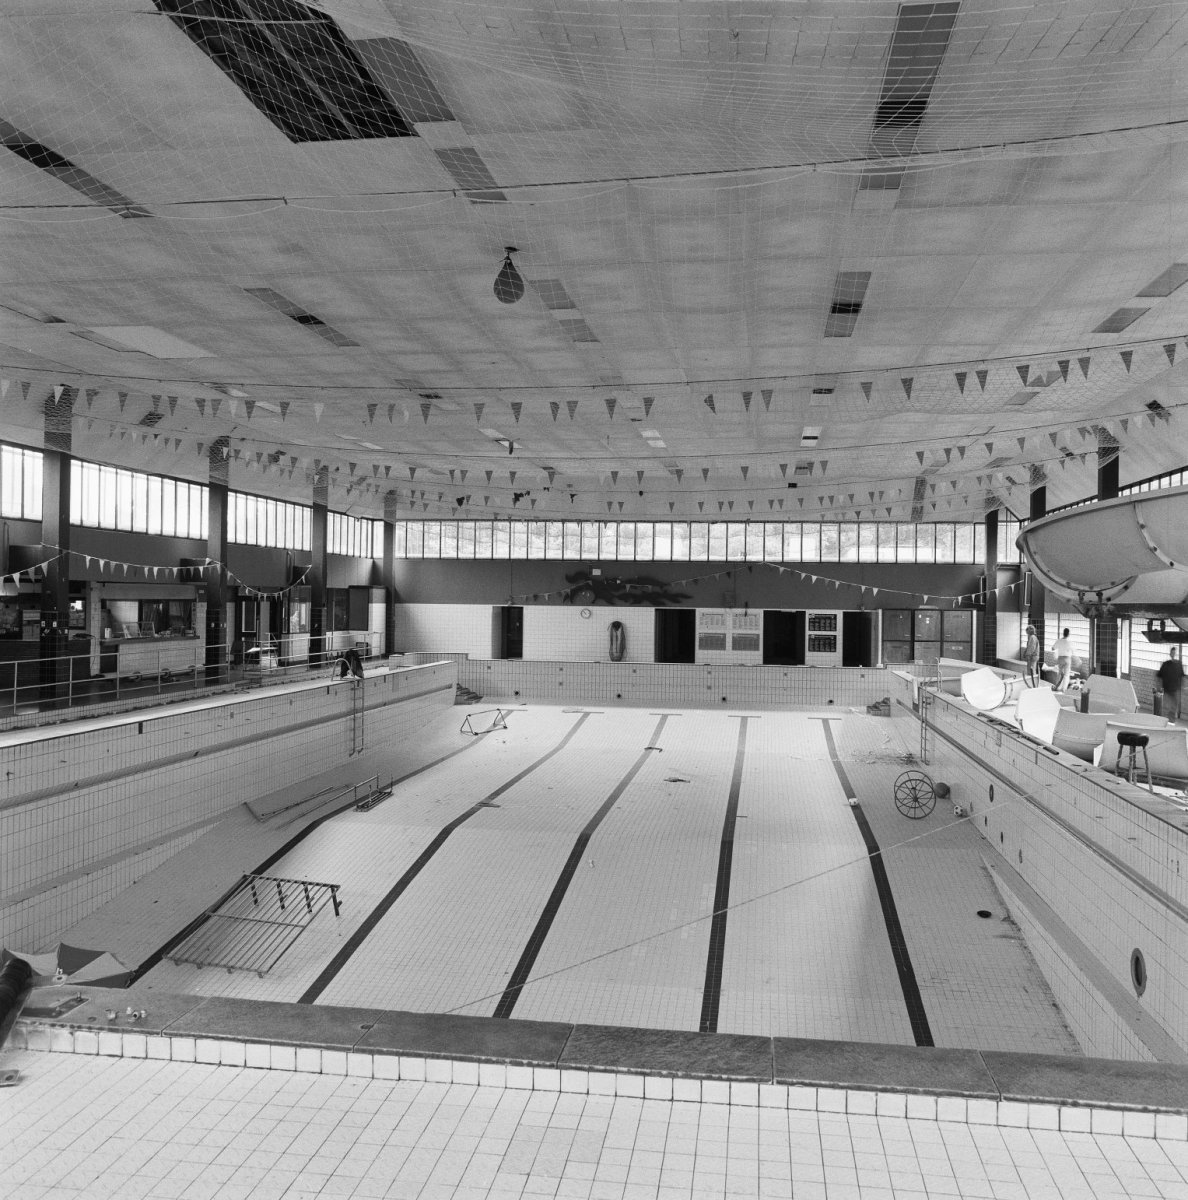 file interieur overzicht zwembad haarlem 20279638